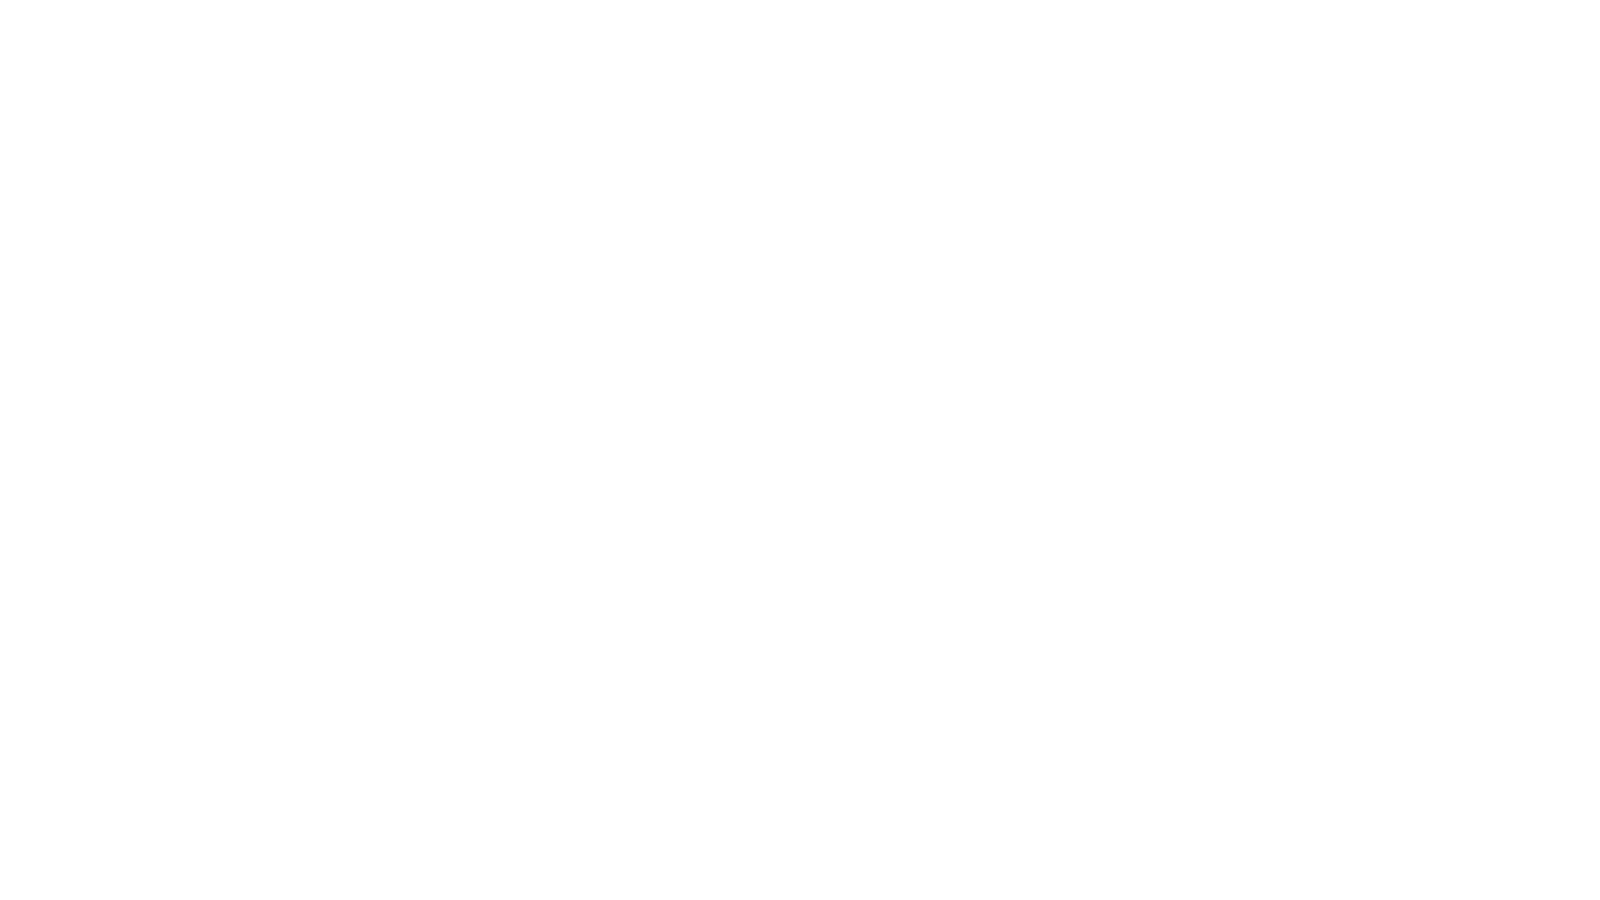 A Taste Of Honey (Paul Desmond & Jim Hall Version, Original by Bobby Scott and Ric Marlow)  Kerstin Haberecht - sax  Lukas Roos - guitar  Luisa B. Melzig - camera Kerstin Haberecht - cut